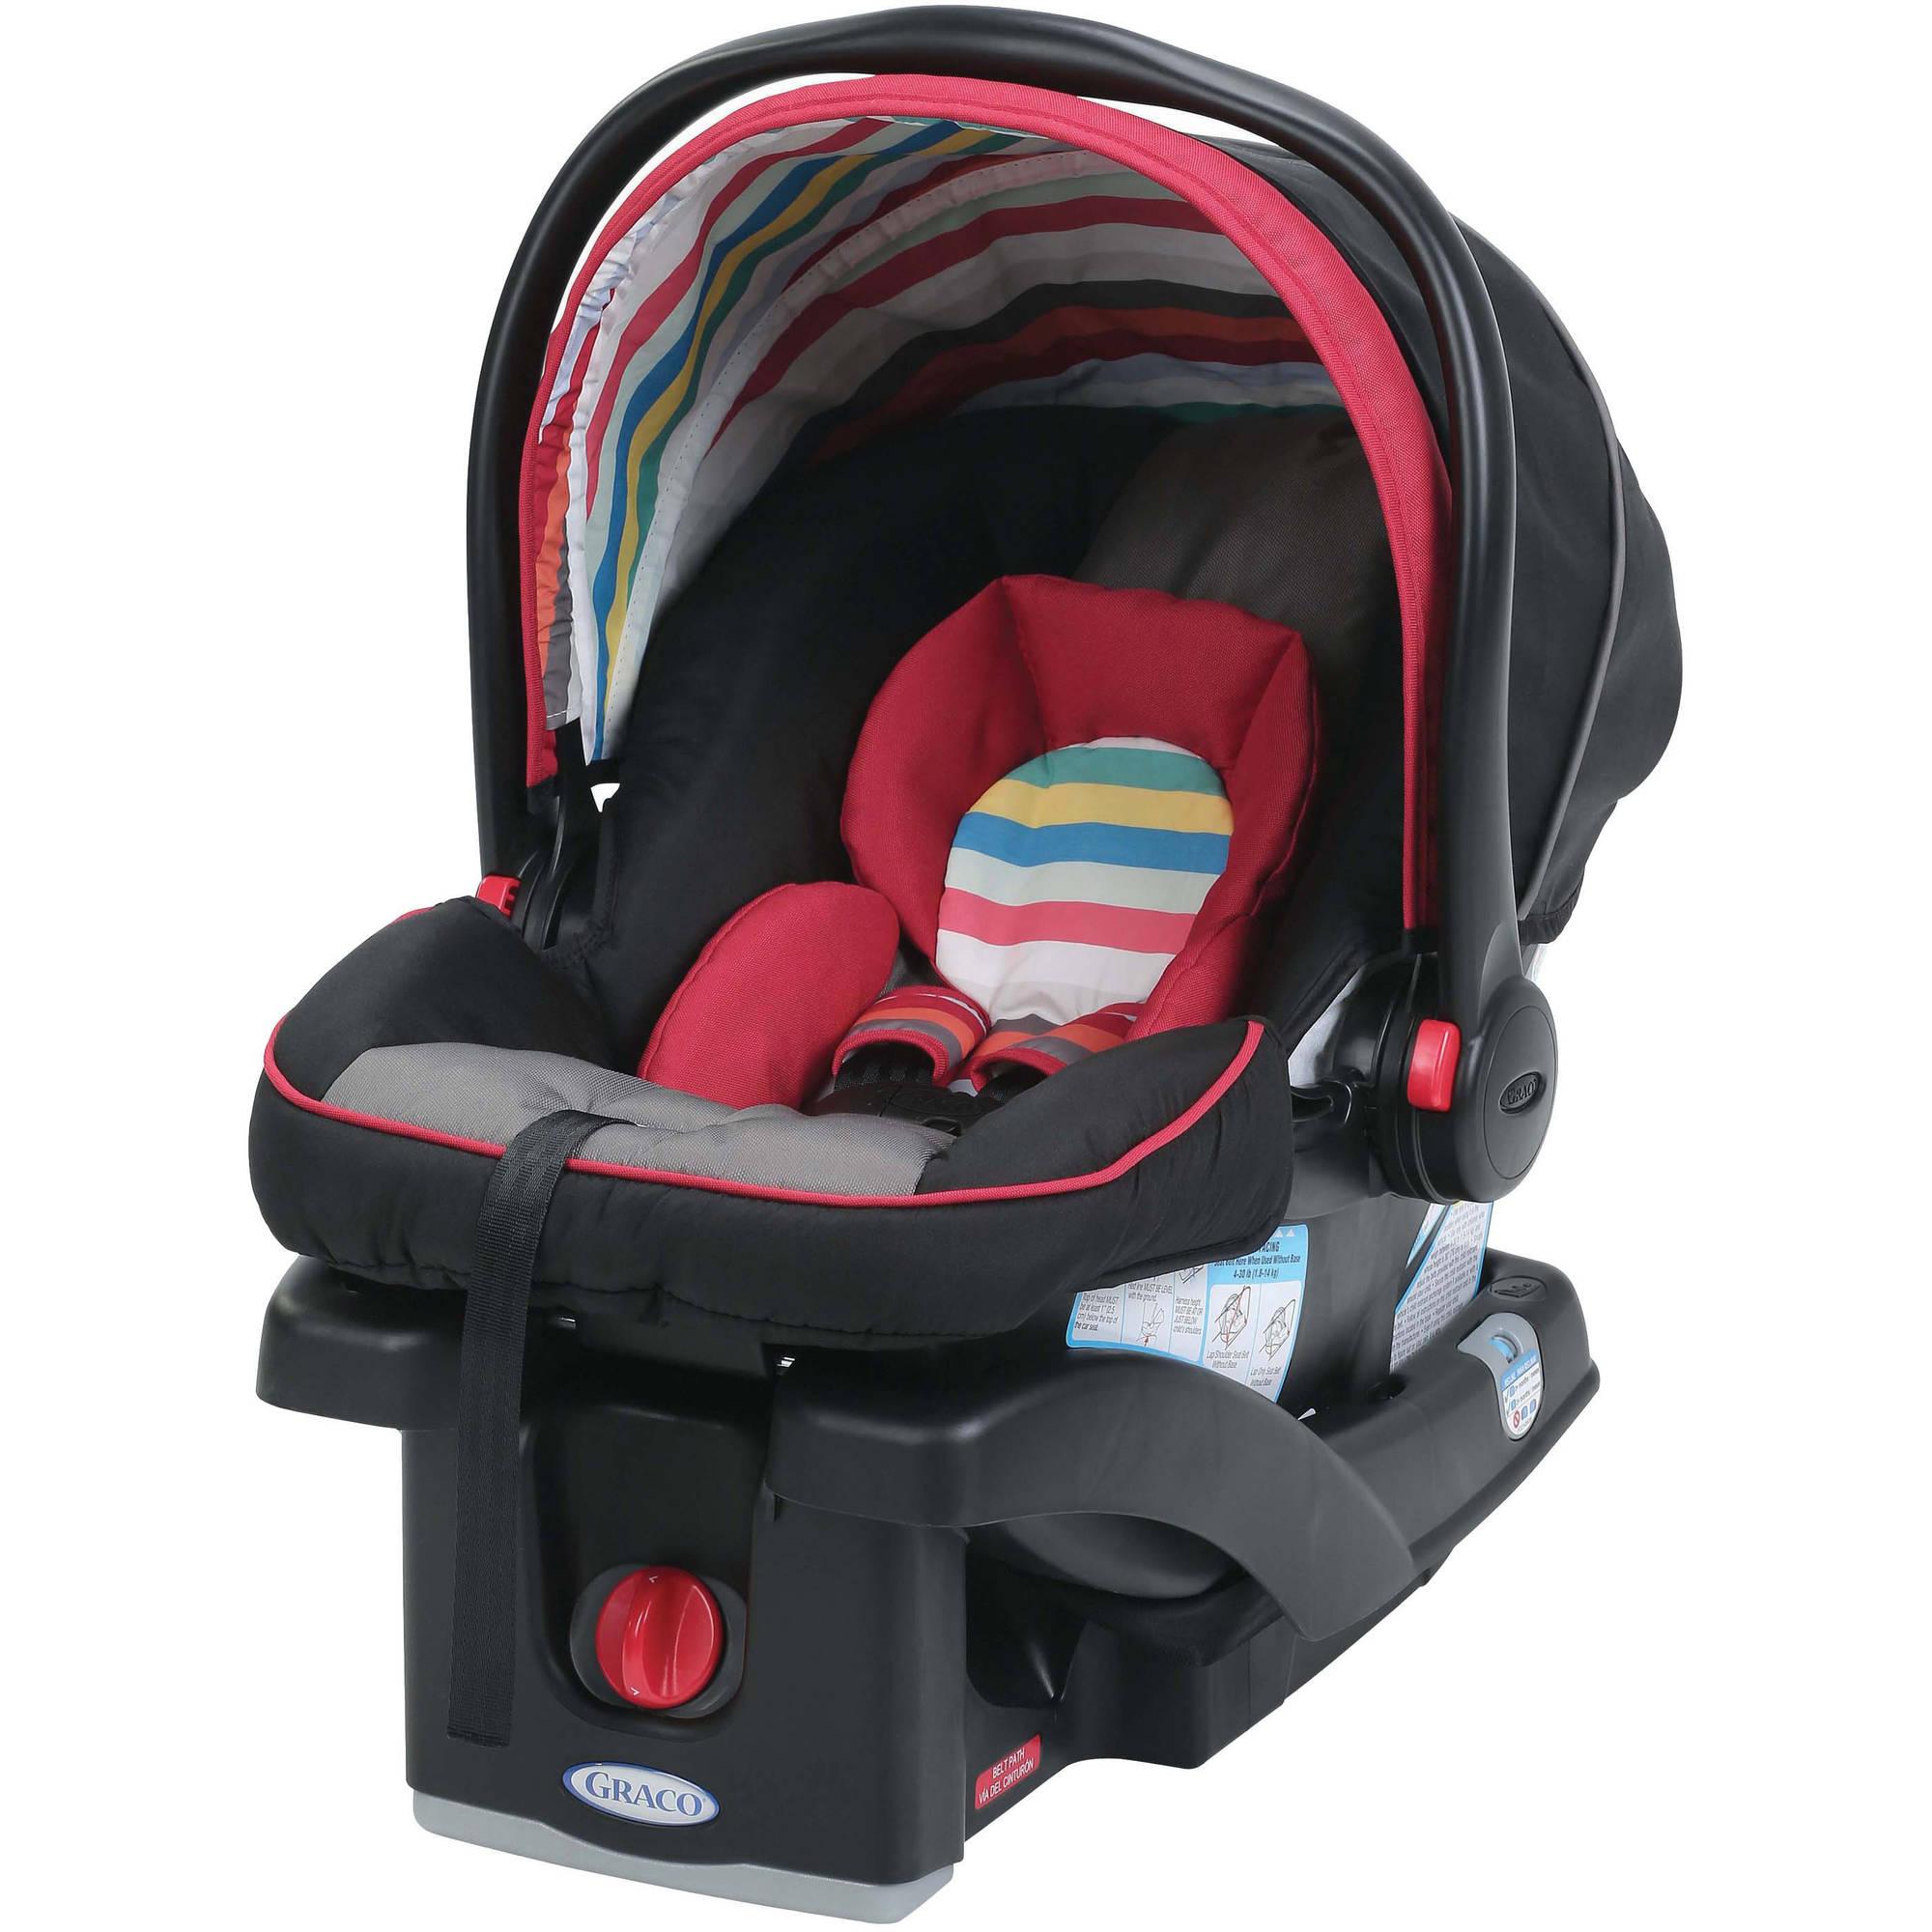 Graco SnugRide Click Connect 30 LX Infant Car Seat w/ Front Adjust, Choose Your Pattern